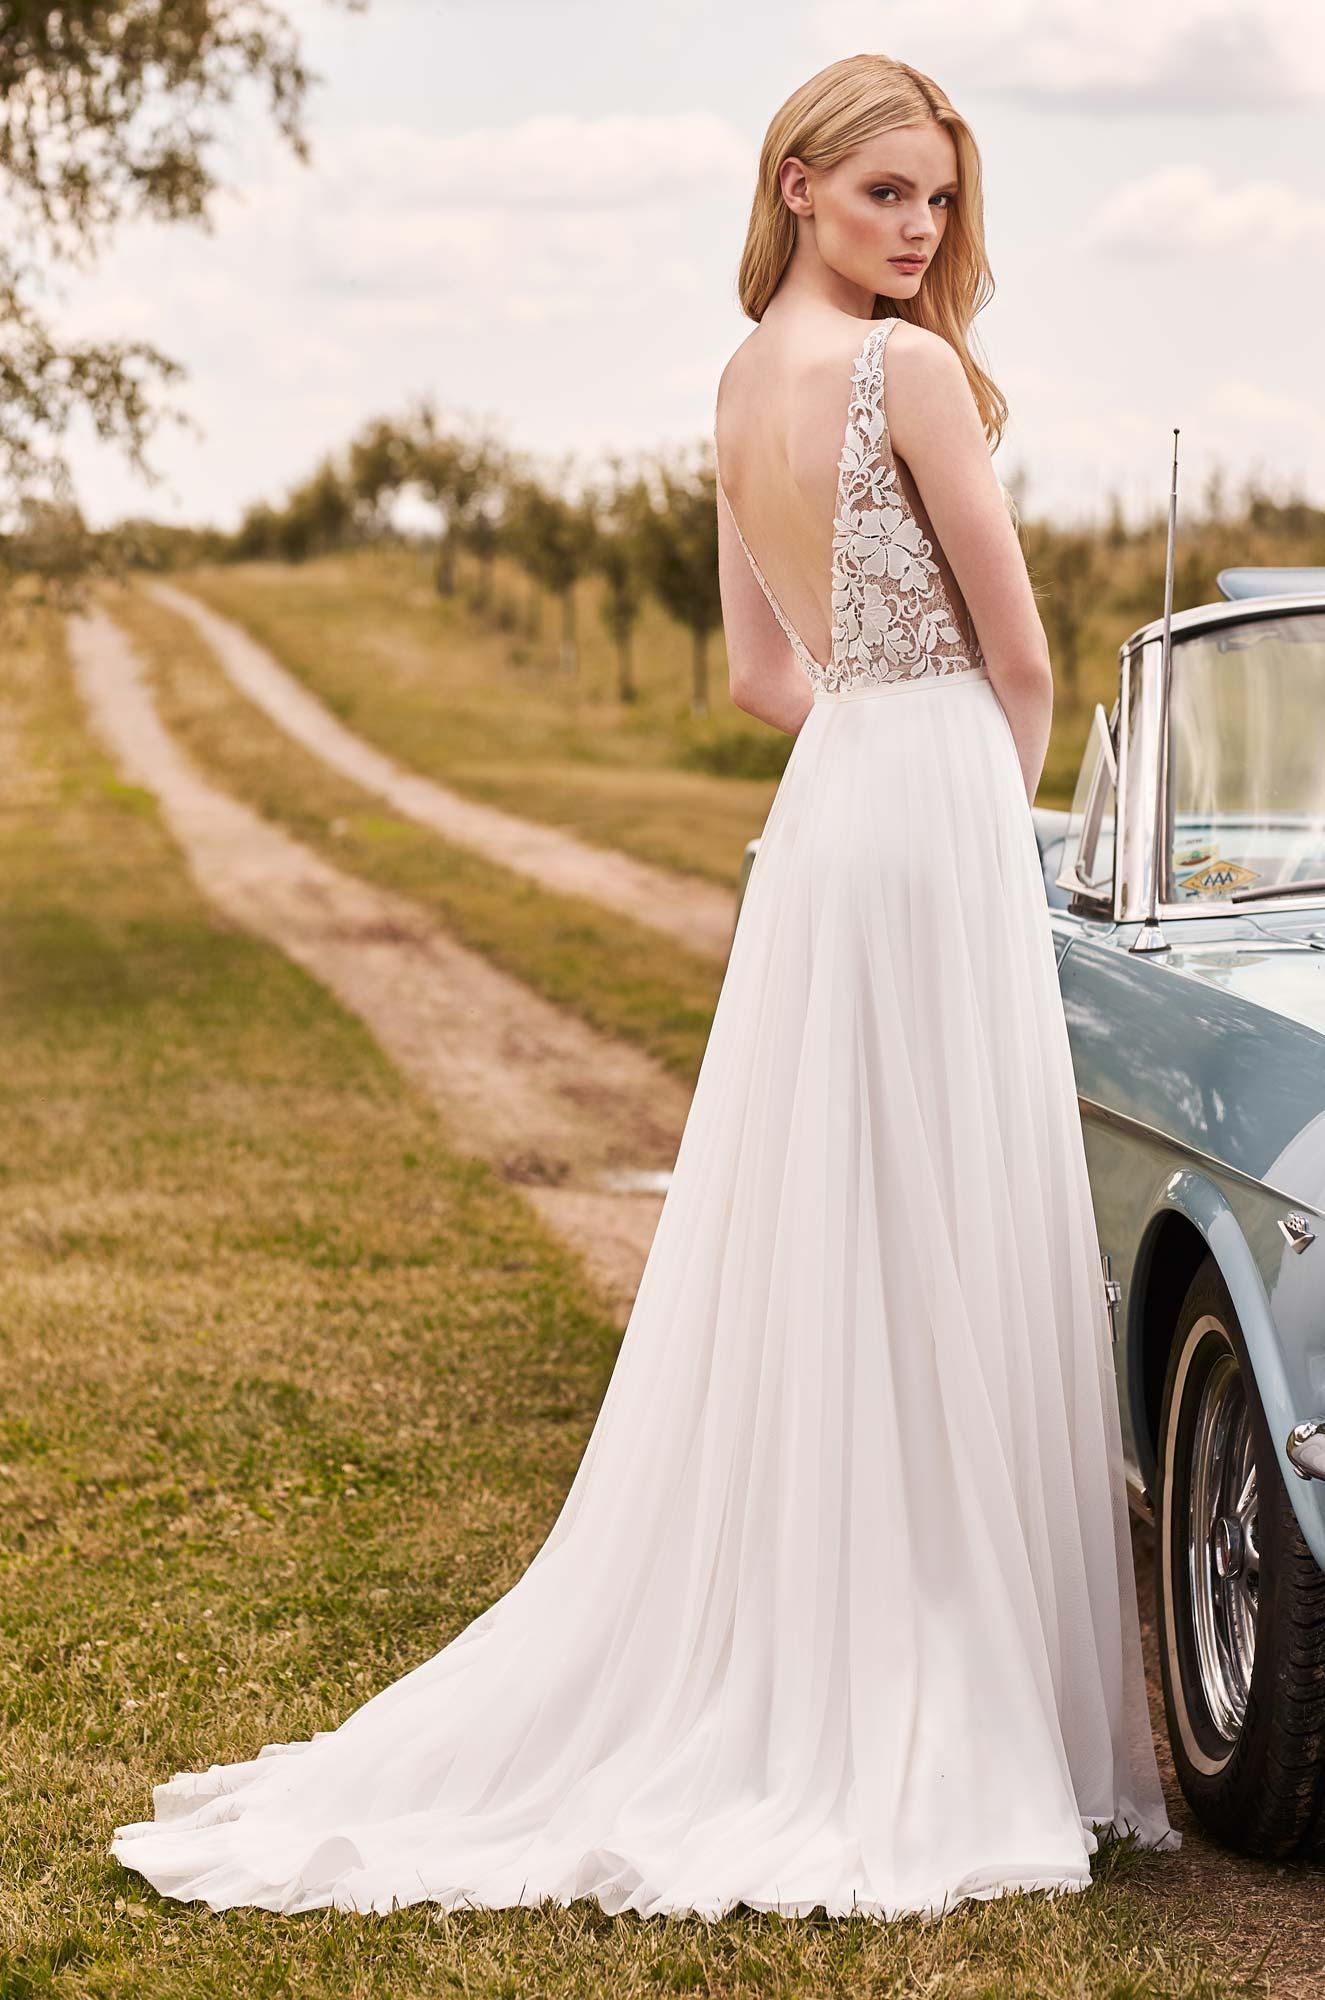 Graceful A-Line Wedding Dress - Style #2296 | Mikaella Bridal